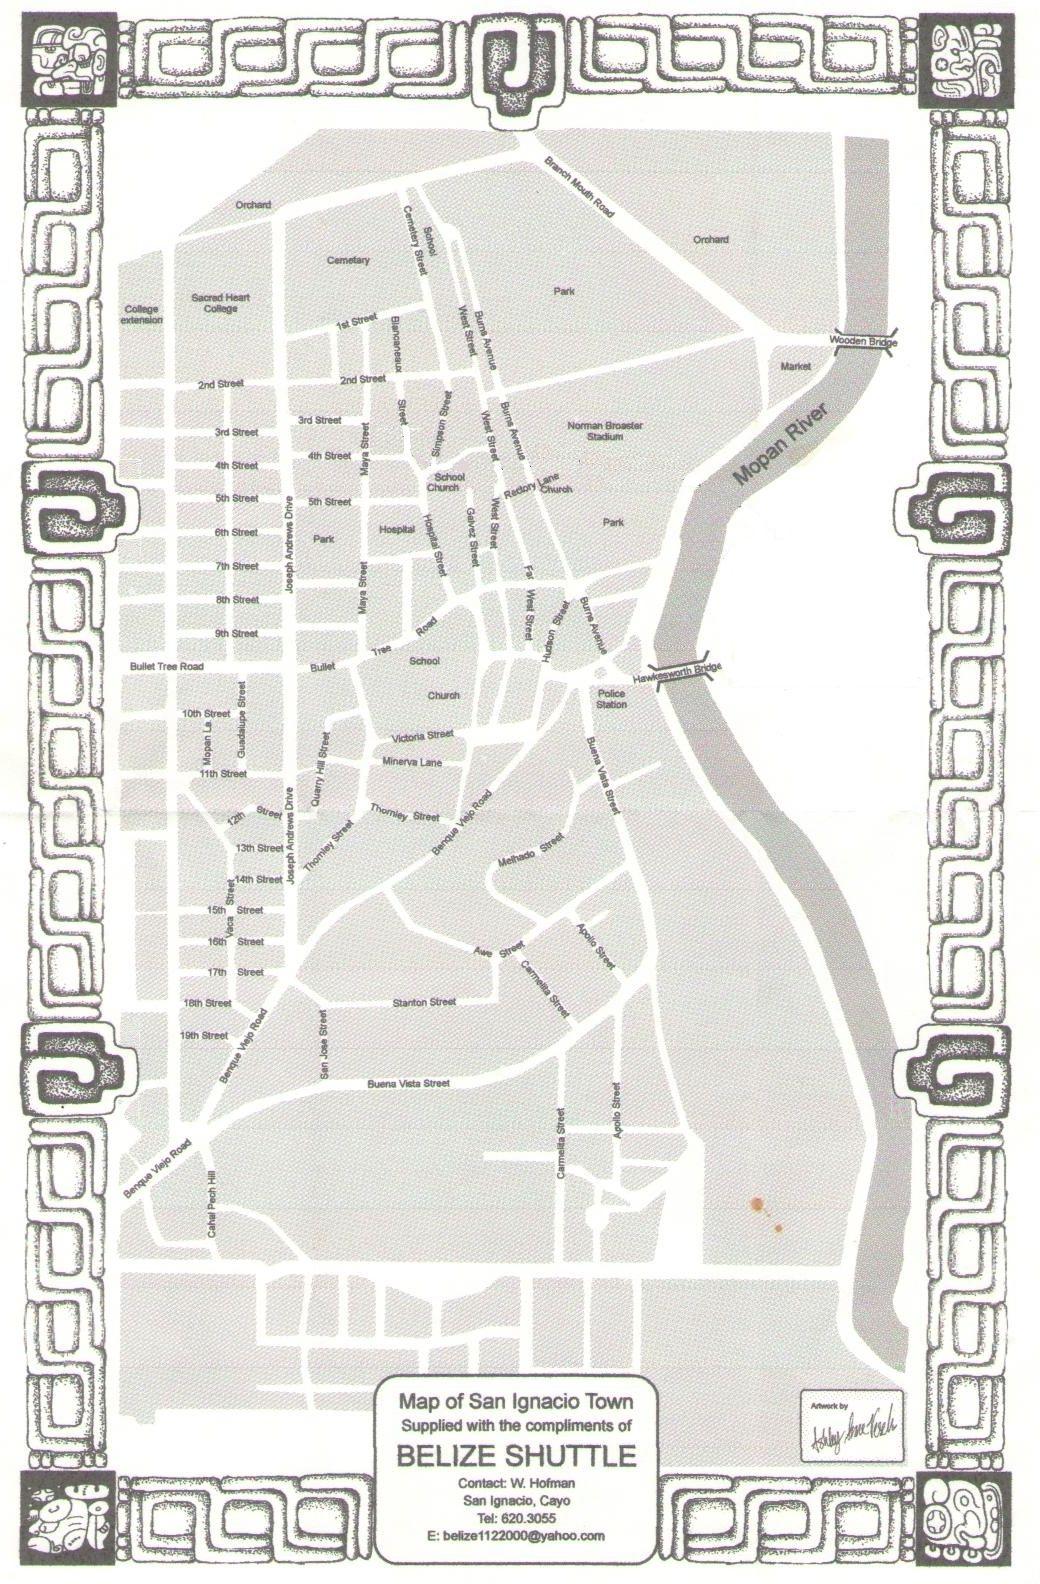 map san ignacio belize San Ignacio Belize Click To View The Full Sized Map Of San map san ignacio belize